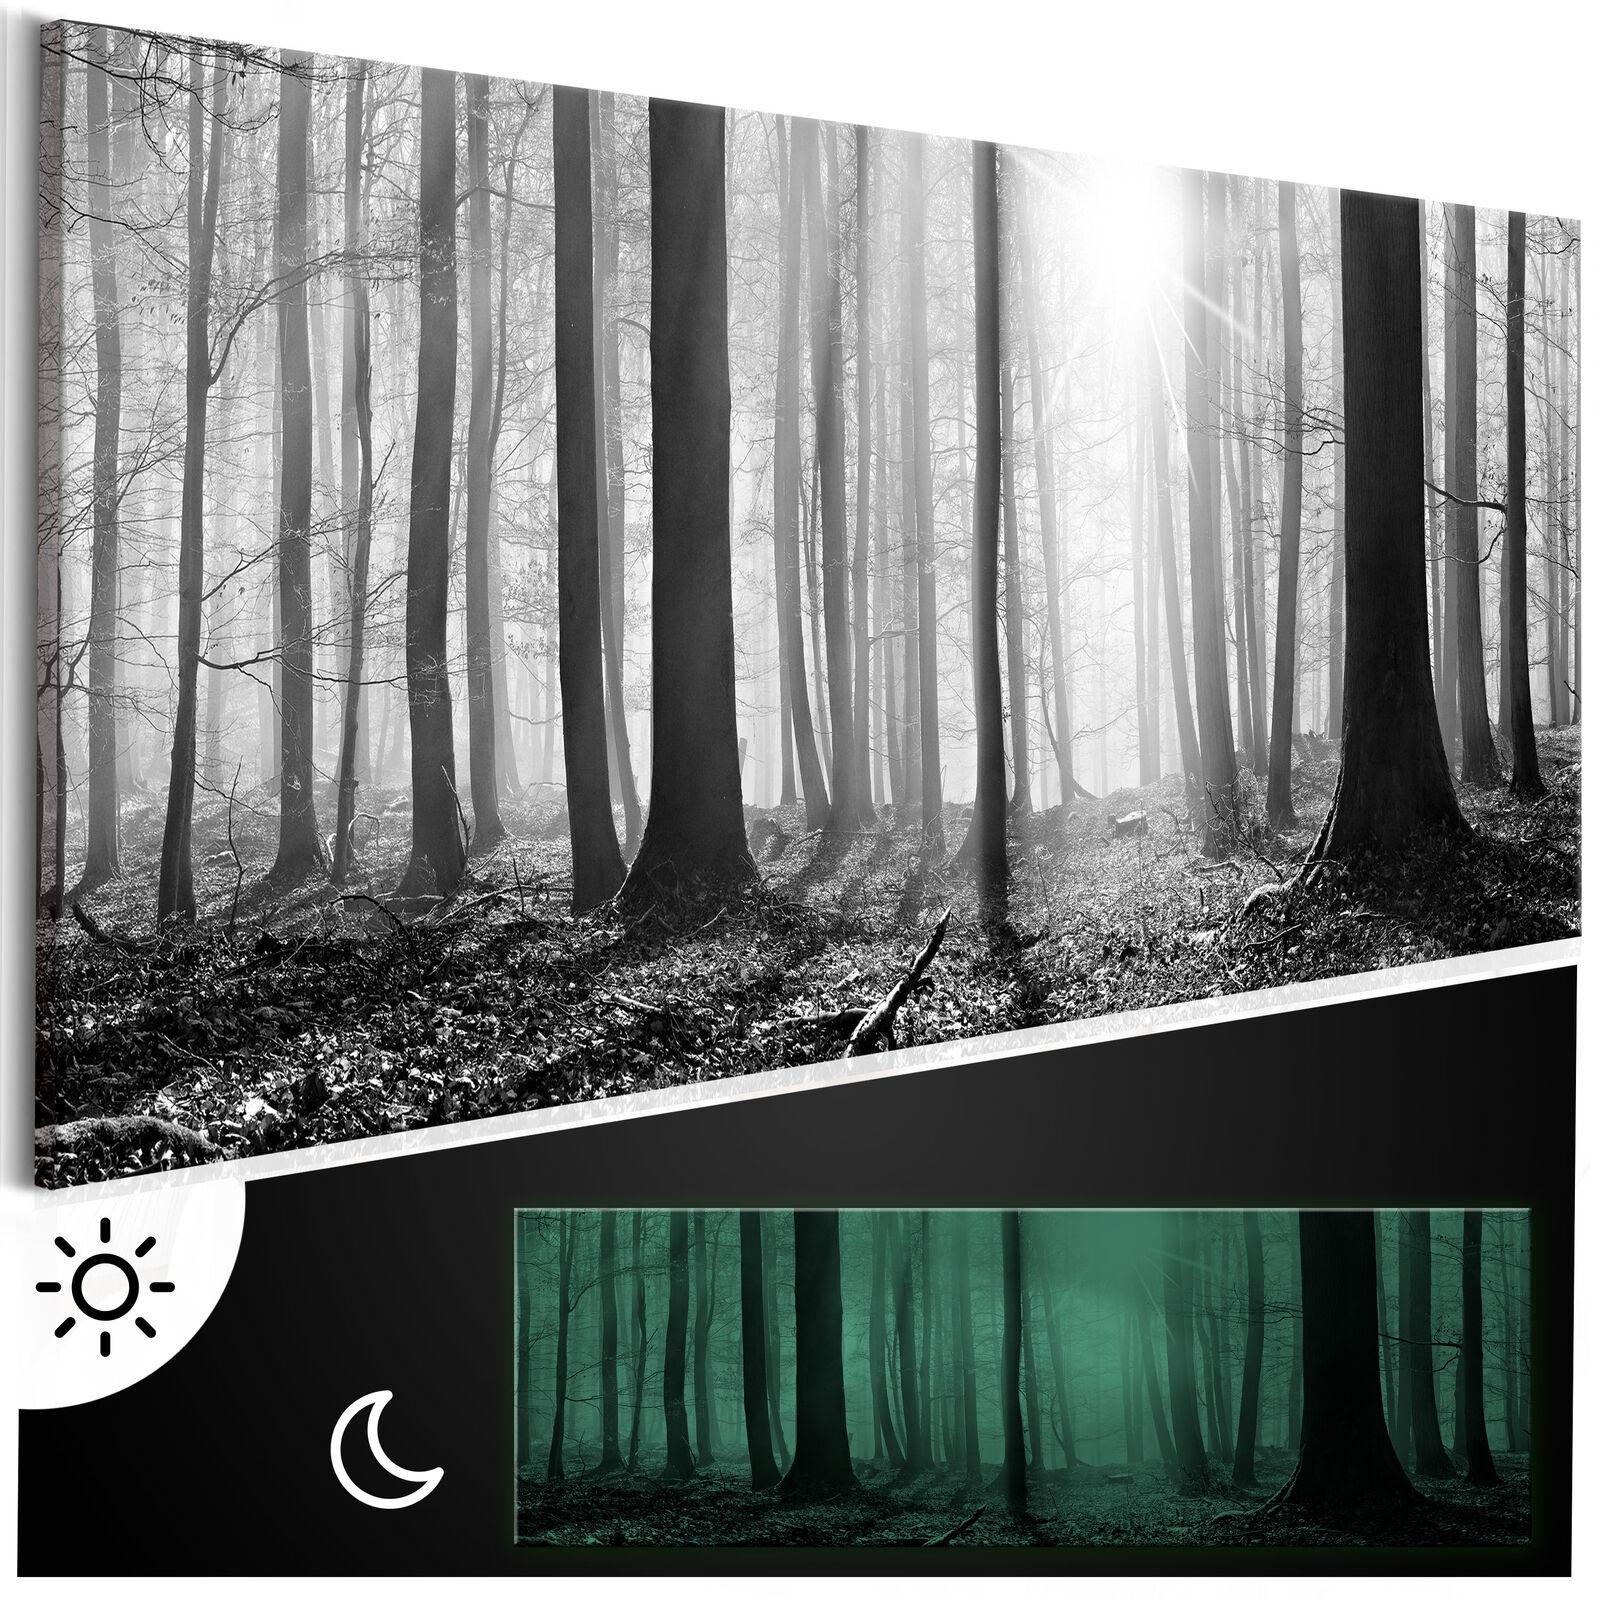 Tag & Nacht Wandbilder xxl nachtleuchtende Bilder 3D nachleuchtend c-B-0235-ag-a